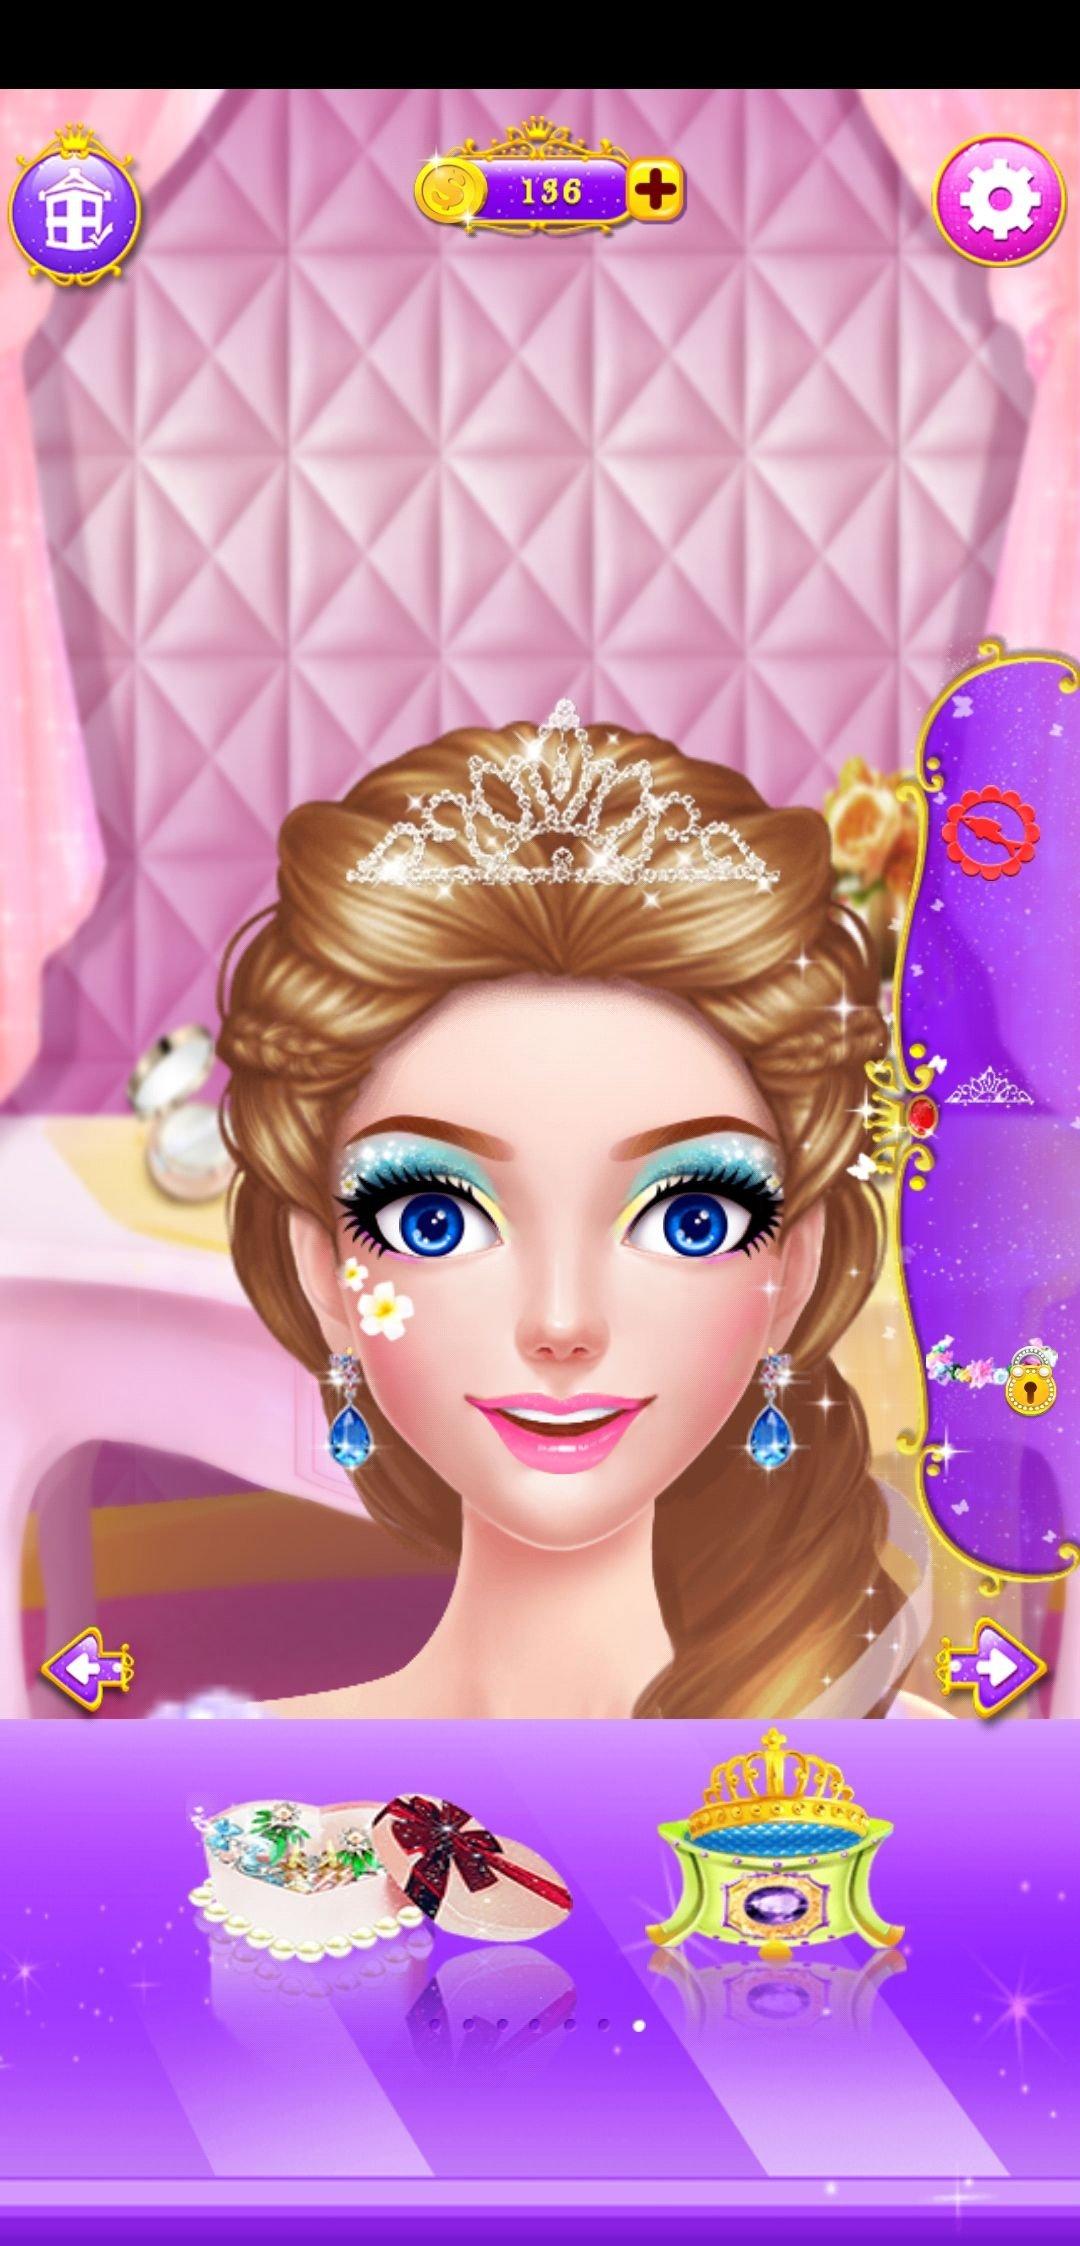 Maquillaje Princesa 3 5 5009 Descargar Para Android Apk Gratis